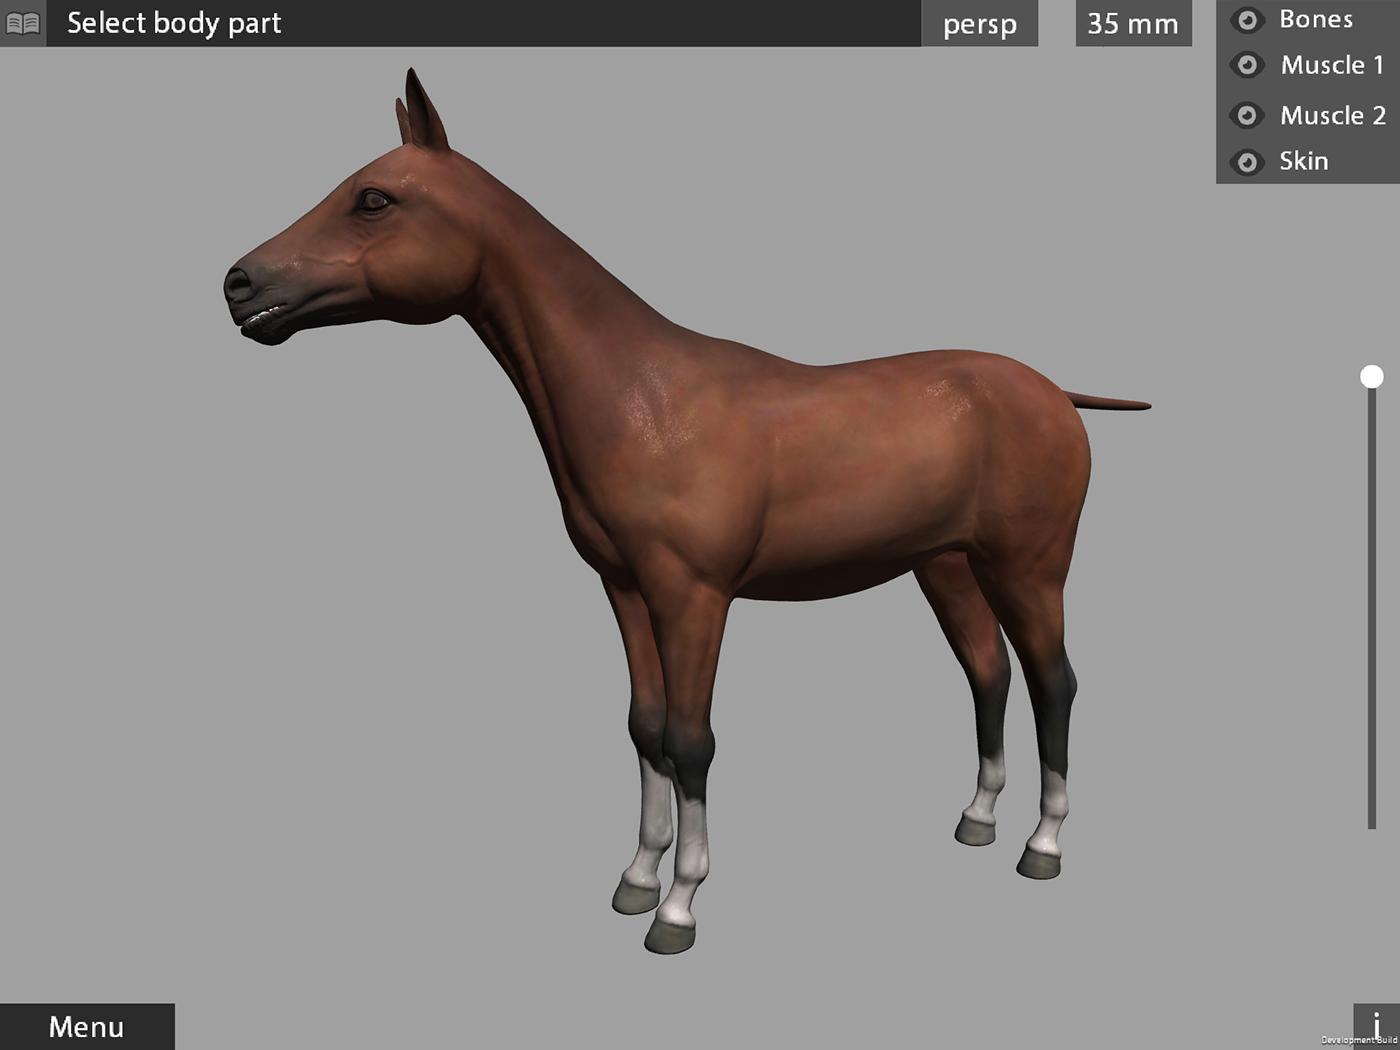 3d animal anatomy app for artists, students, teachers, on Behance